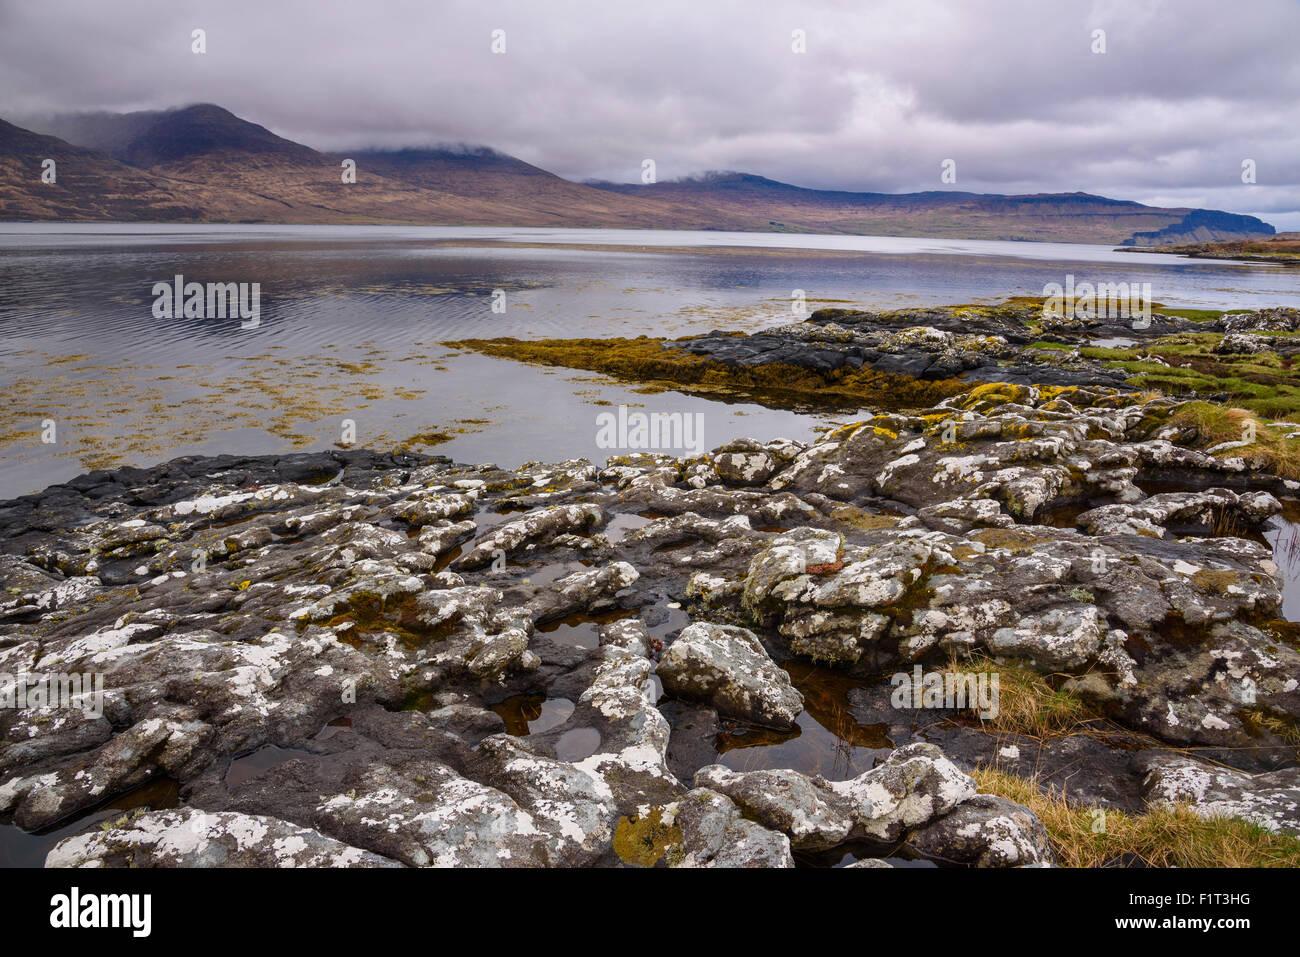 Loch na Keal, near Kellan, Isle of Mull, Inner Hebrides, Argyll and Bute, Scotland, United Kingdom, Europe - Stock Image